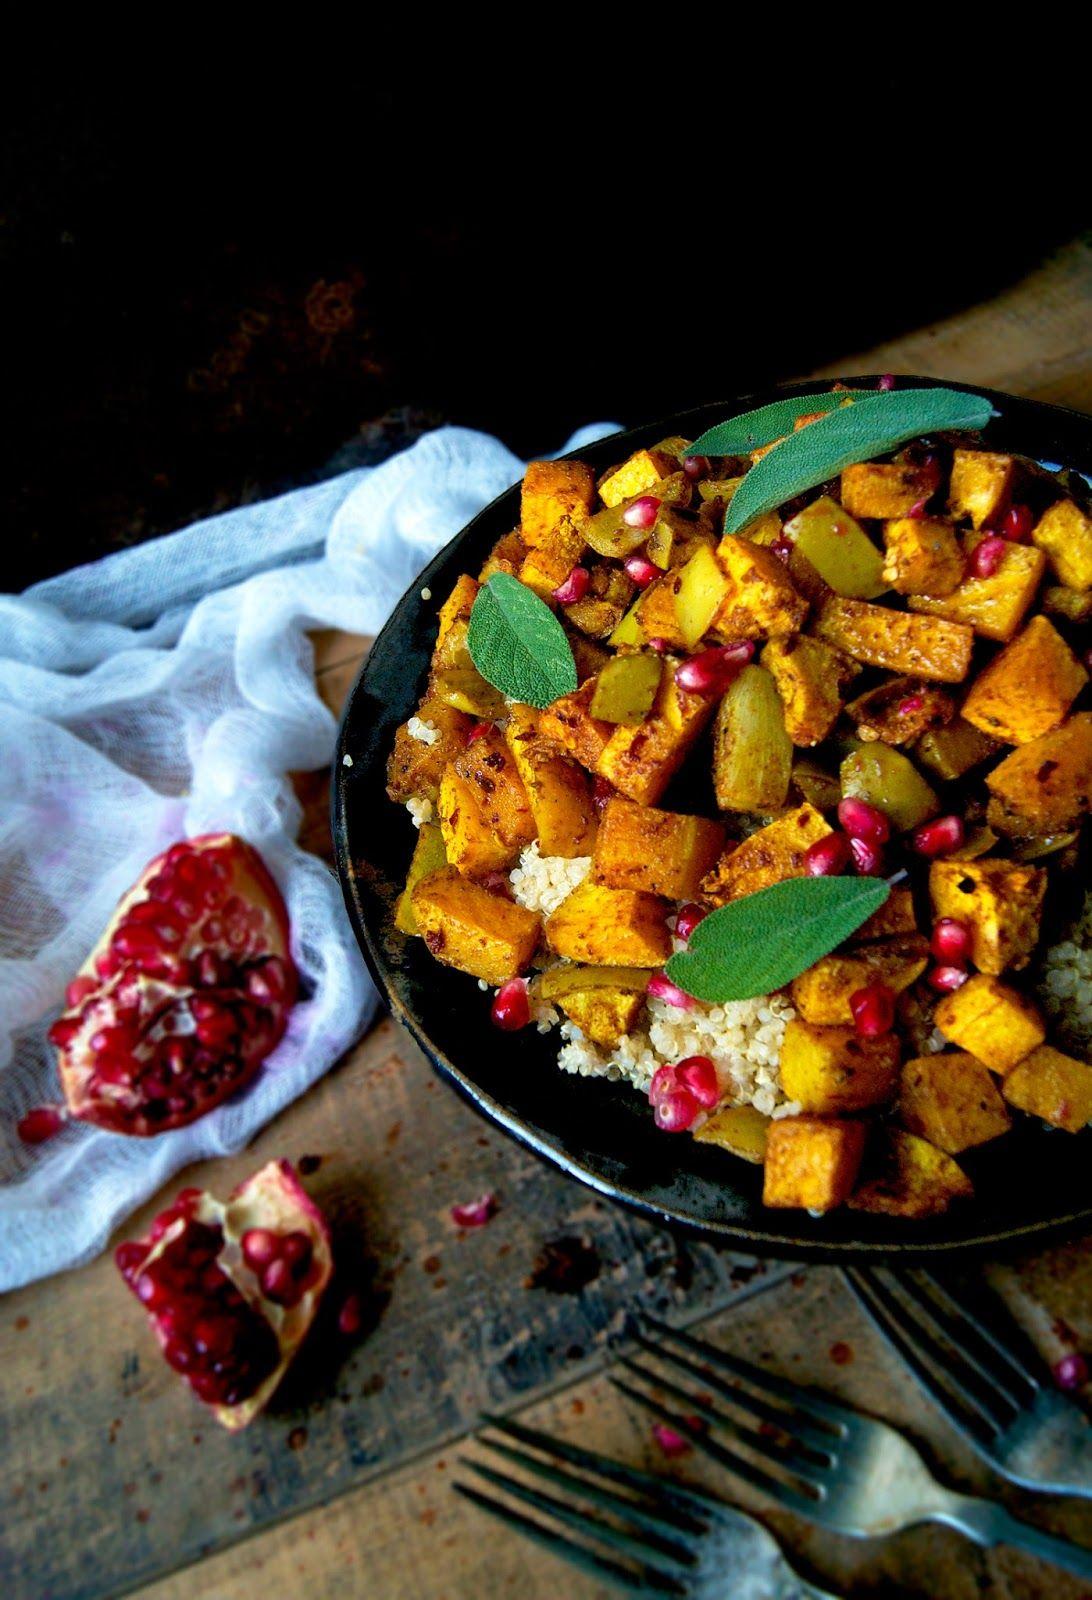 Warm Moroccan Roasted Vegetable Salad